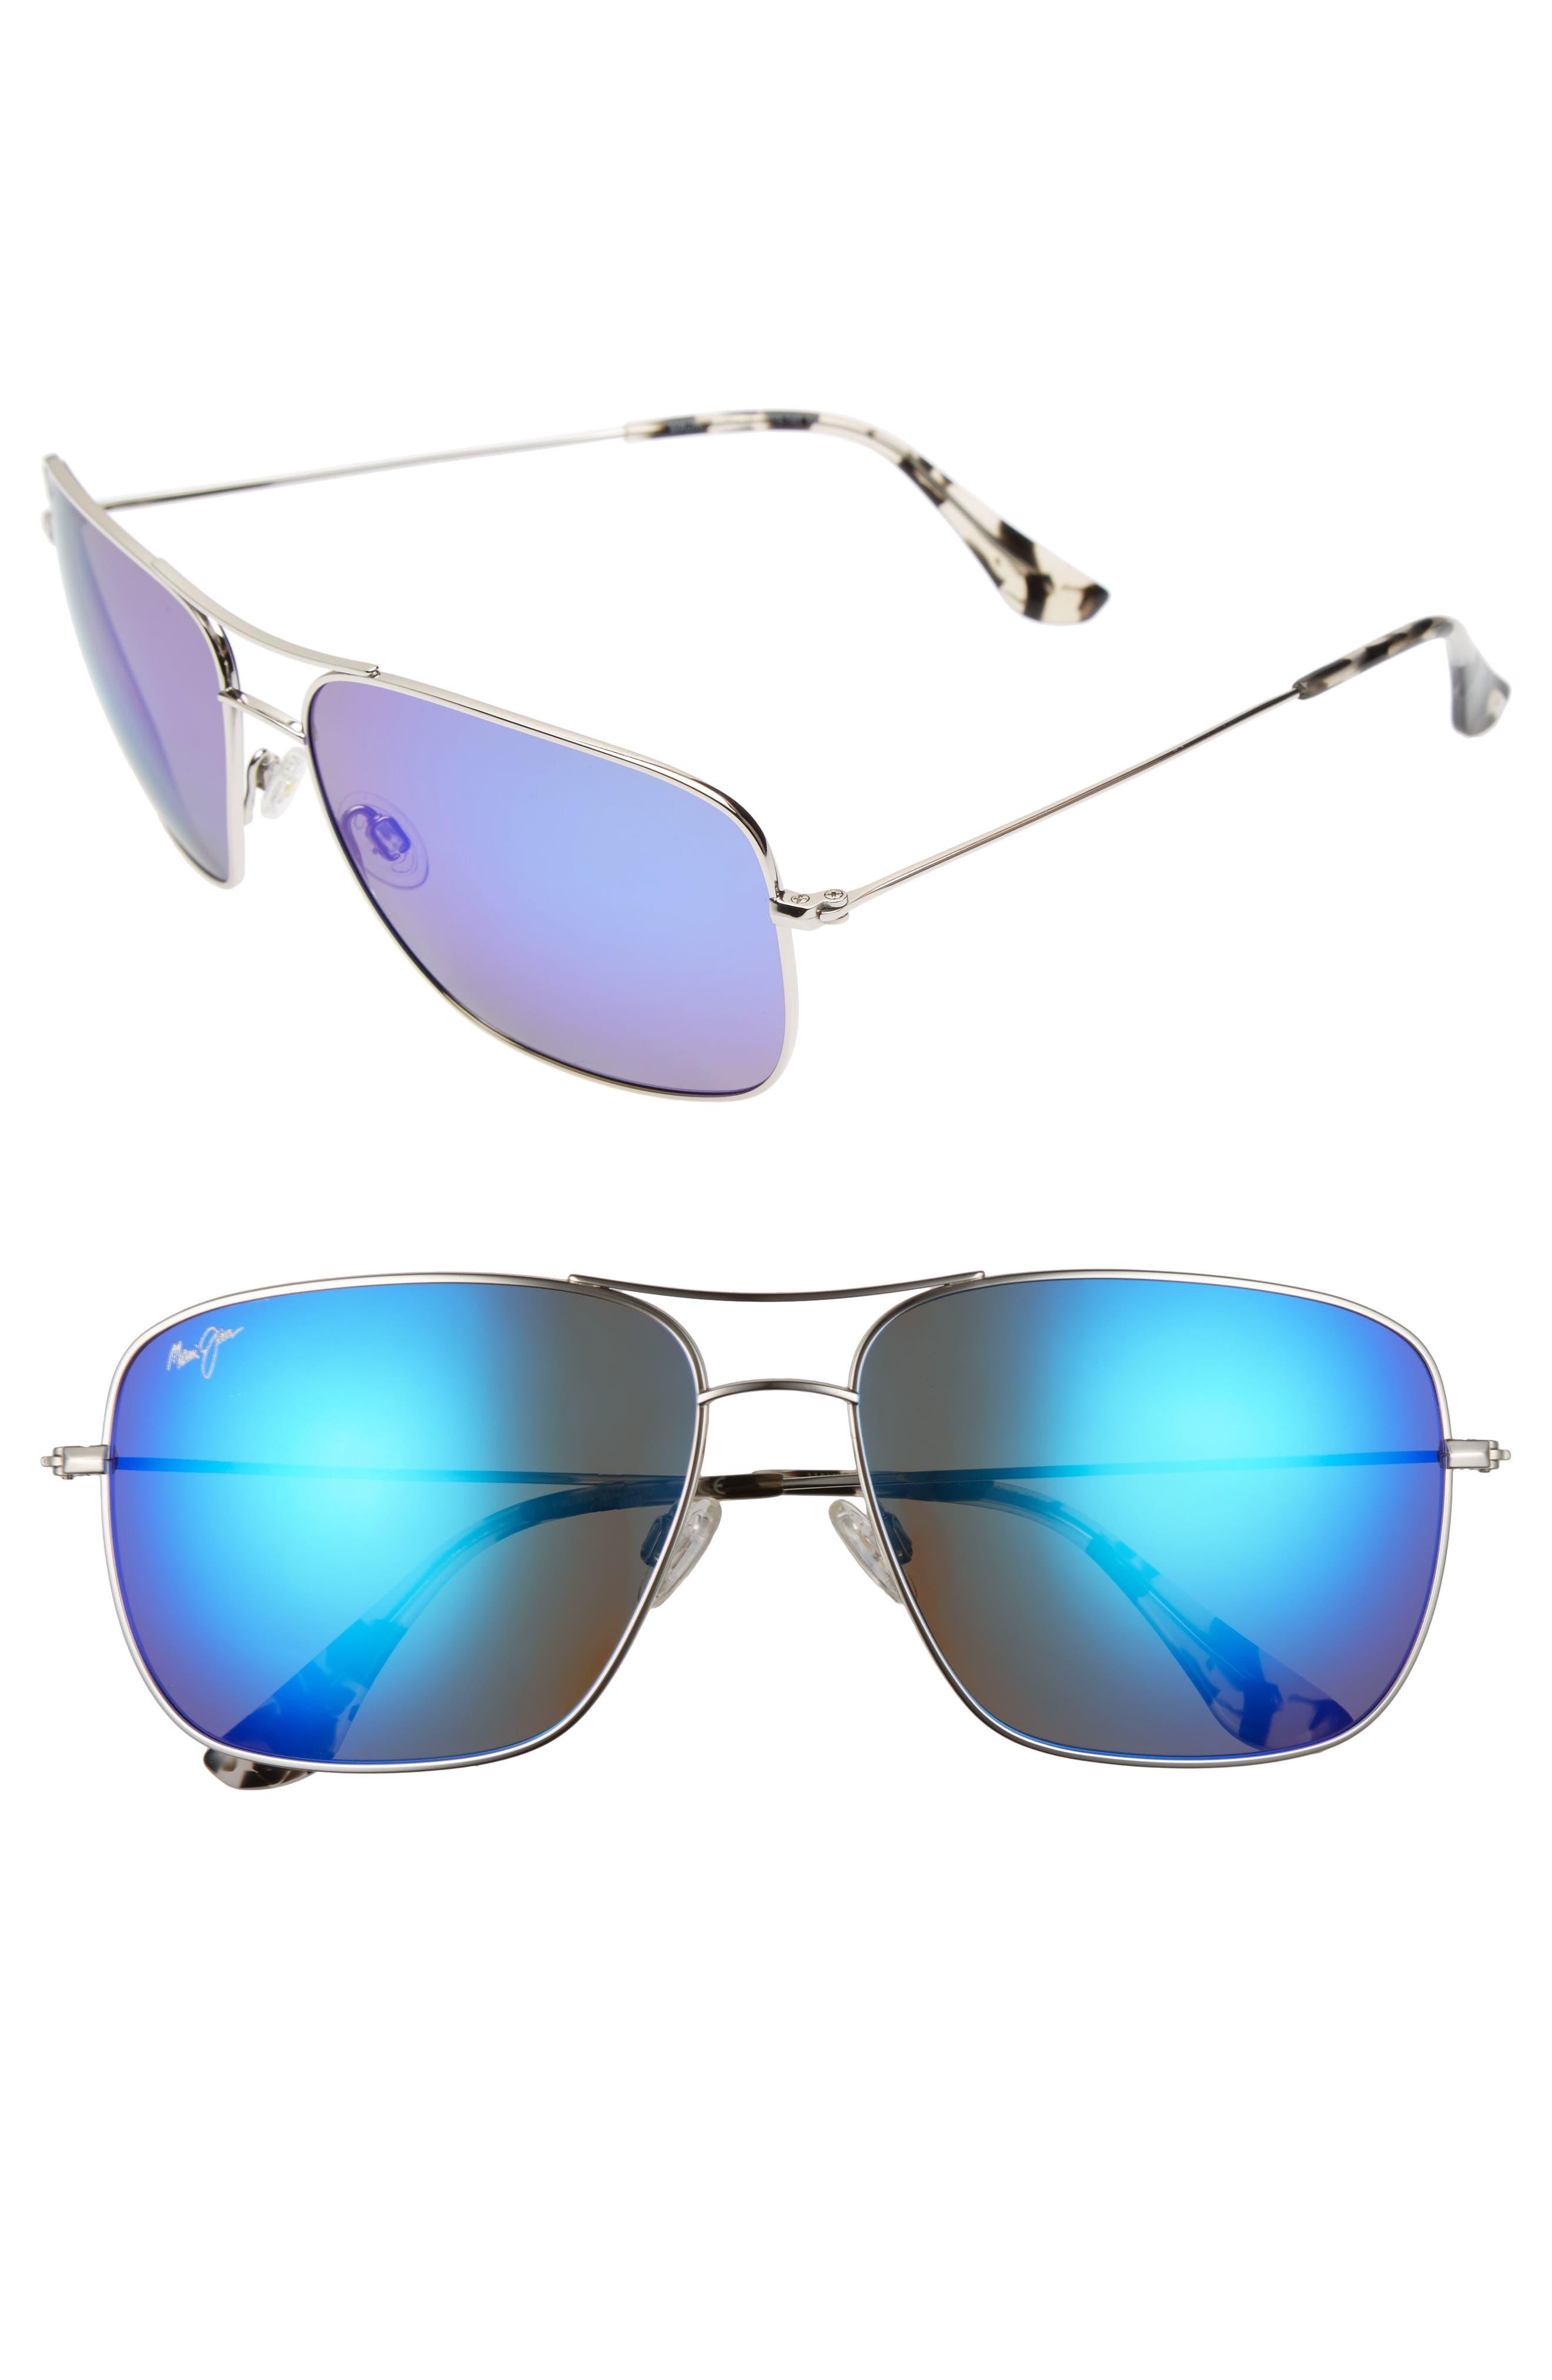 Cook Pines 63mm Polarized Titanium Aviator Sunglasses,                             Main thumbnail 1, color,                             040